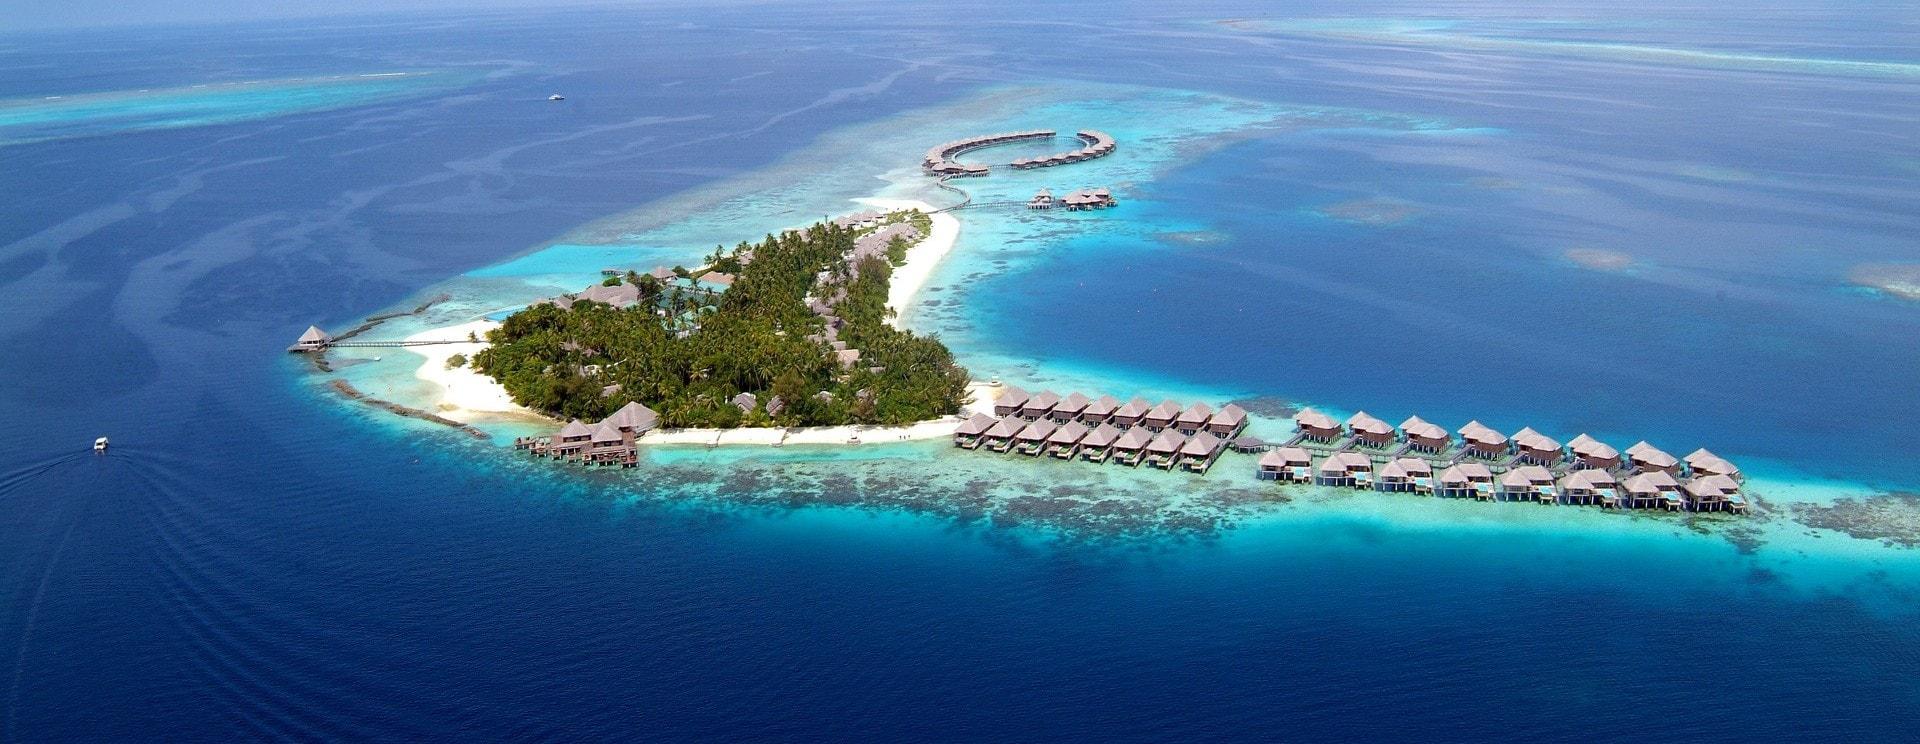 Coco Bodu Hithi Resort - Default